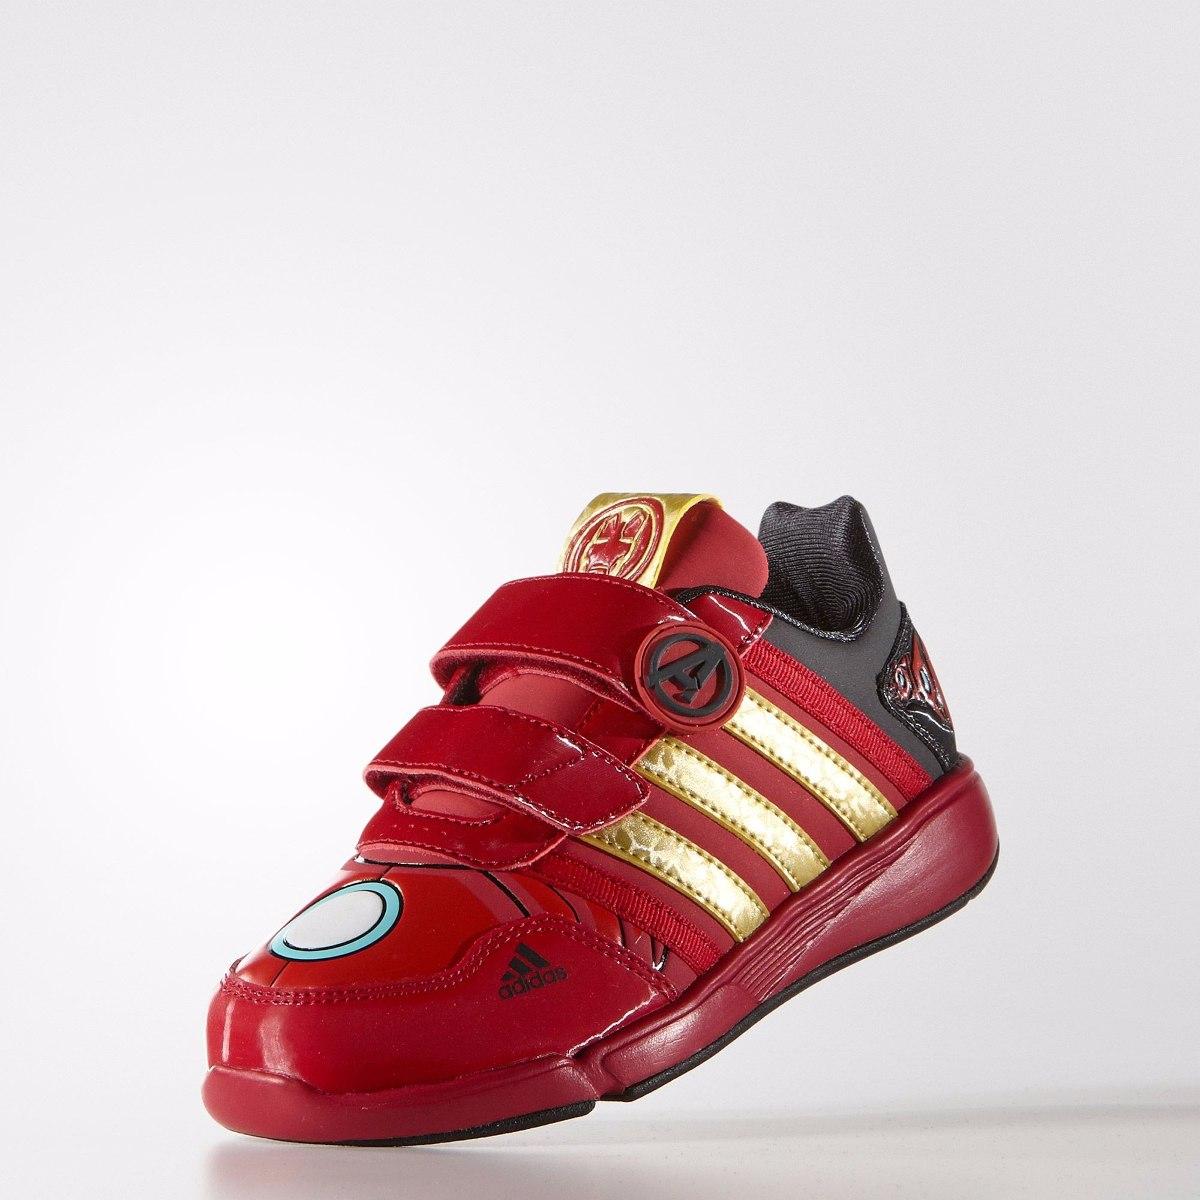 713cc0e4631 Tenis Marvel Avengers Iron Man Velcro Niño adidas B23896 -   499.00 ...